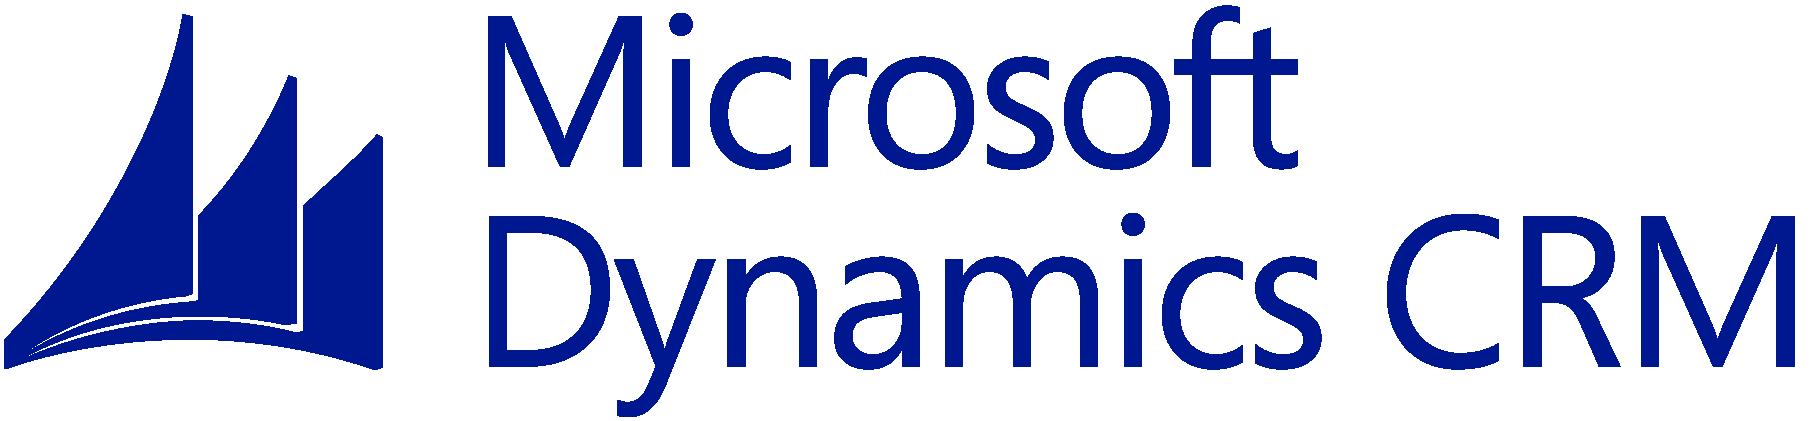 Microsoft Dynamics Crm Icon #218780.